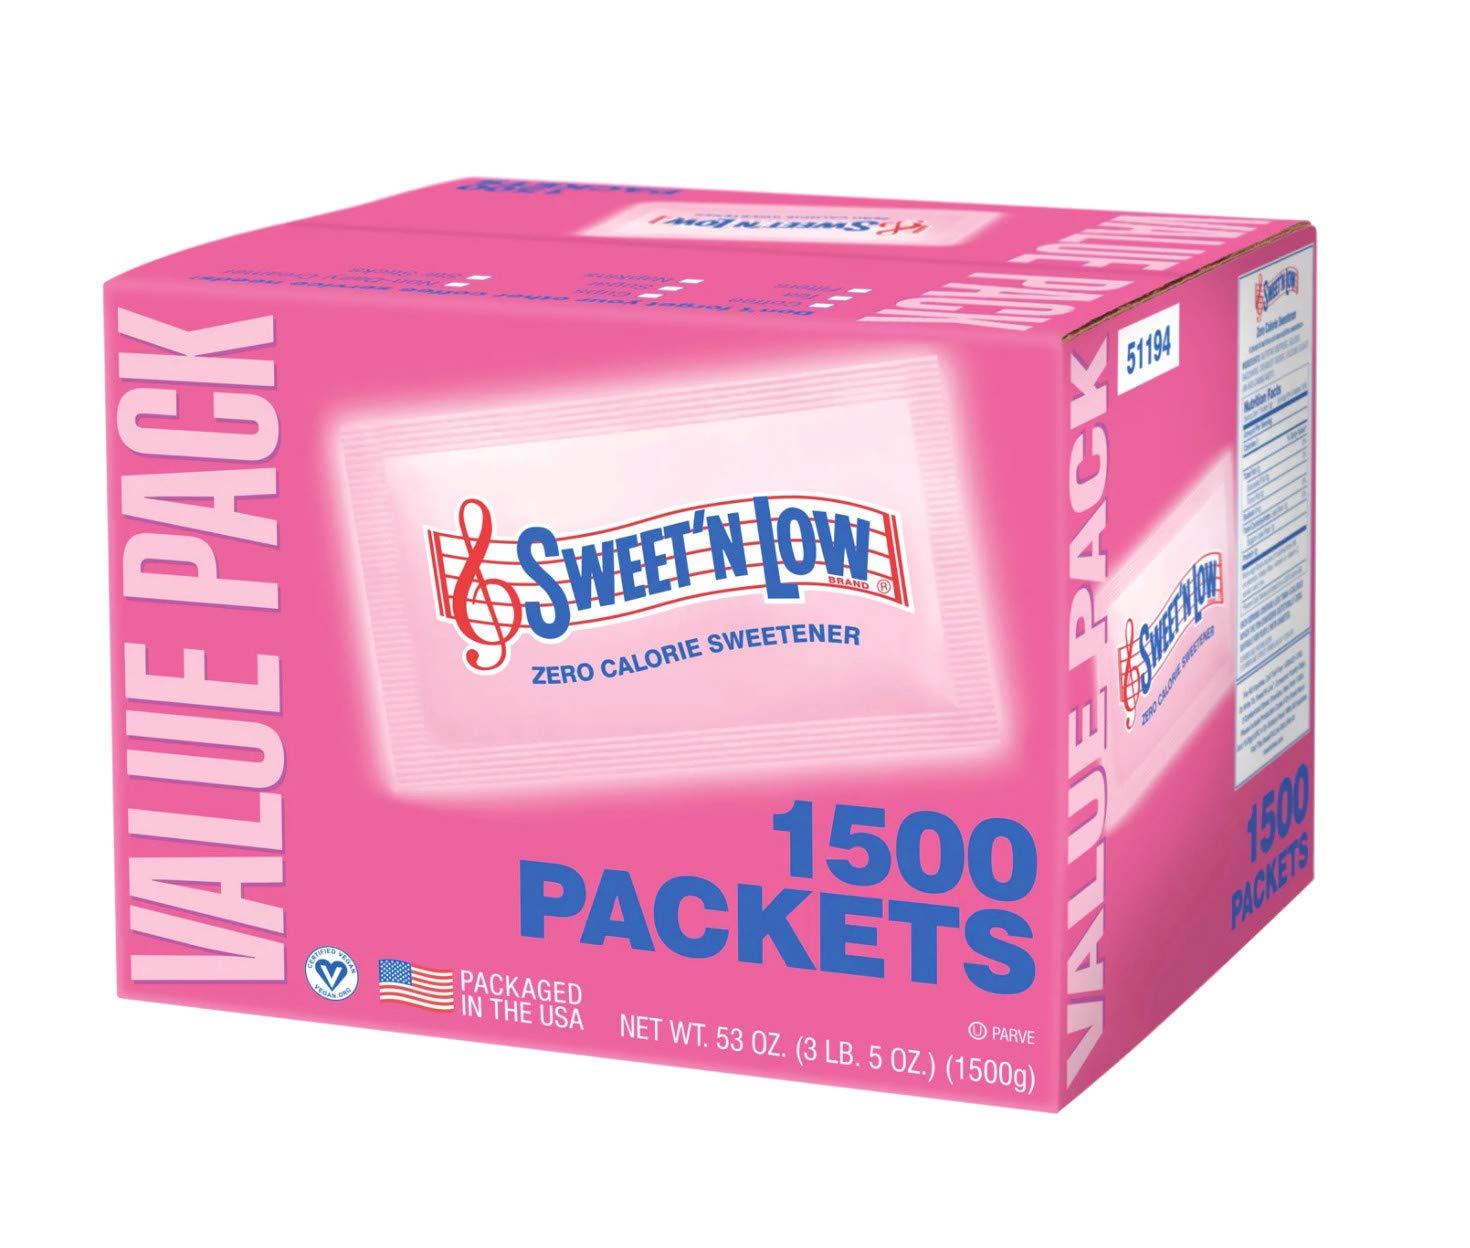 Sweet & Low sugar substitute (Case of 1500)